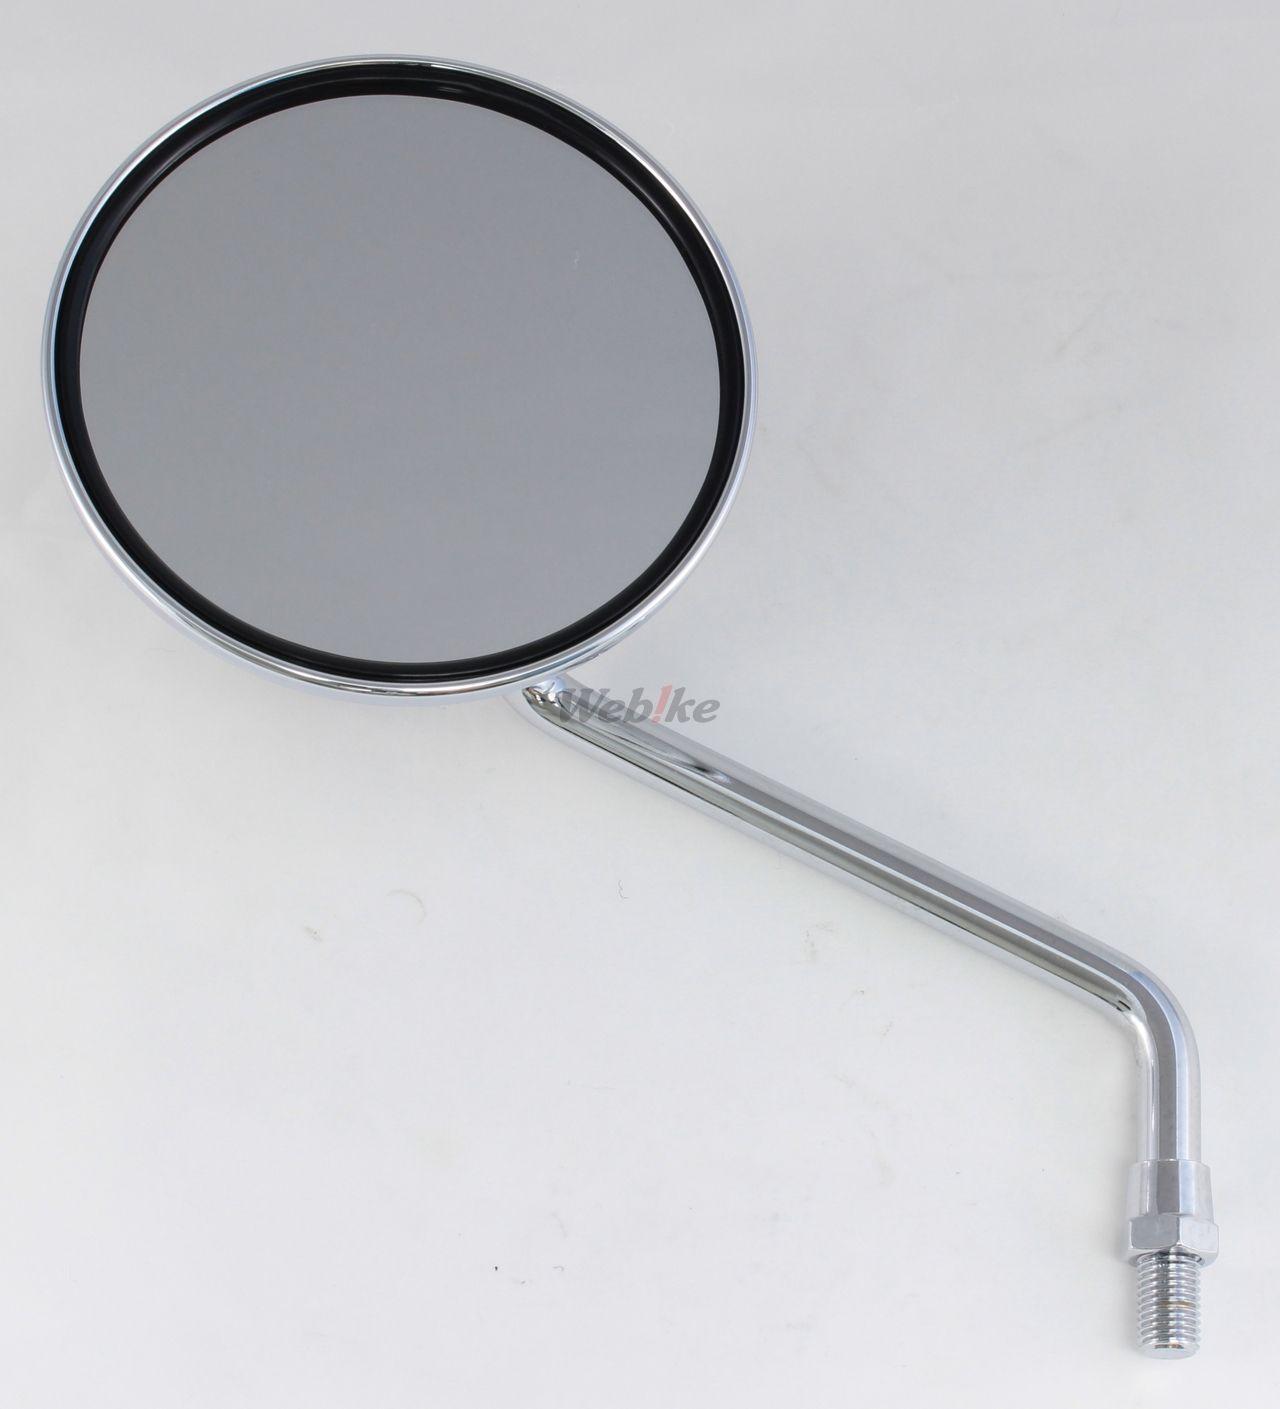 【POSH】圓形短後視鏡 - 「Webike-摩托百貨」